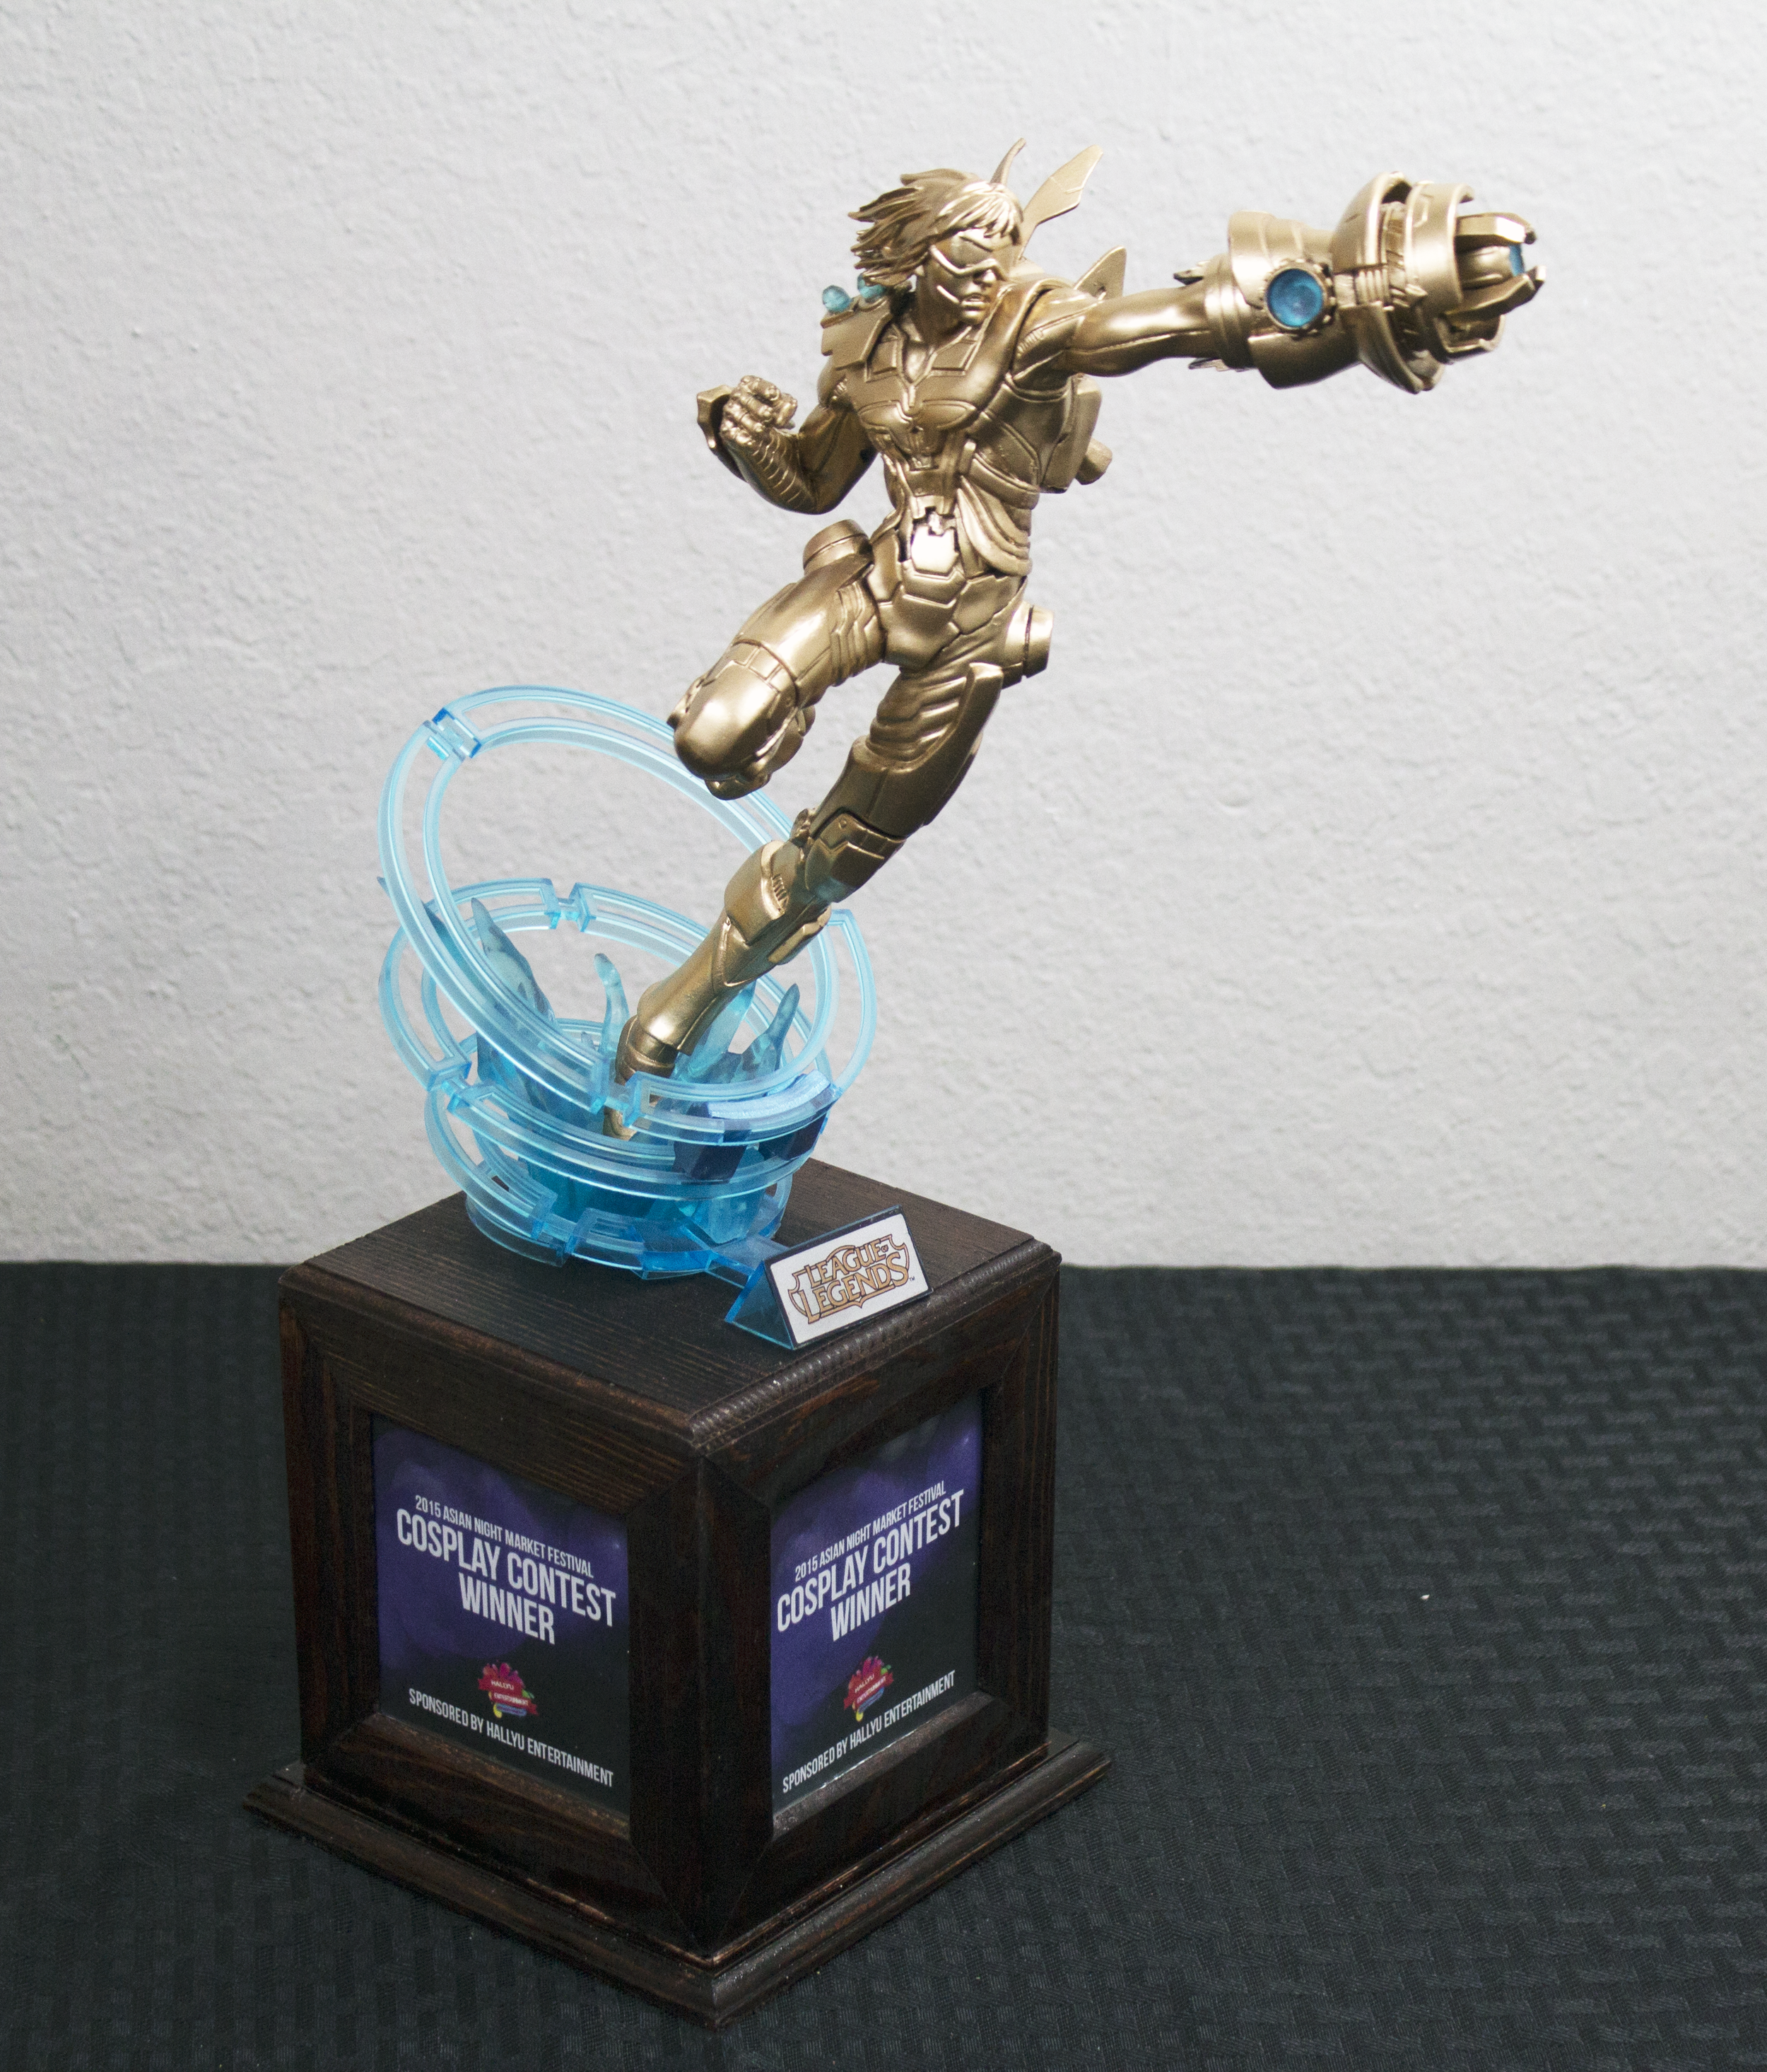 League of Legends Custom Trophy Ezrael